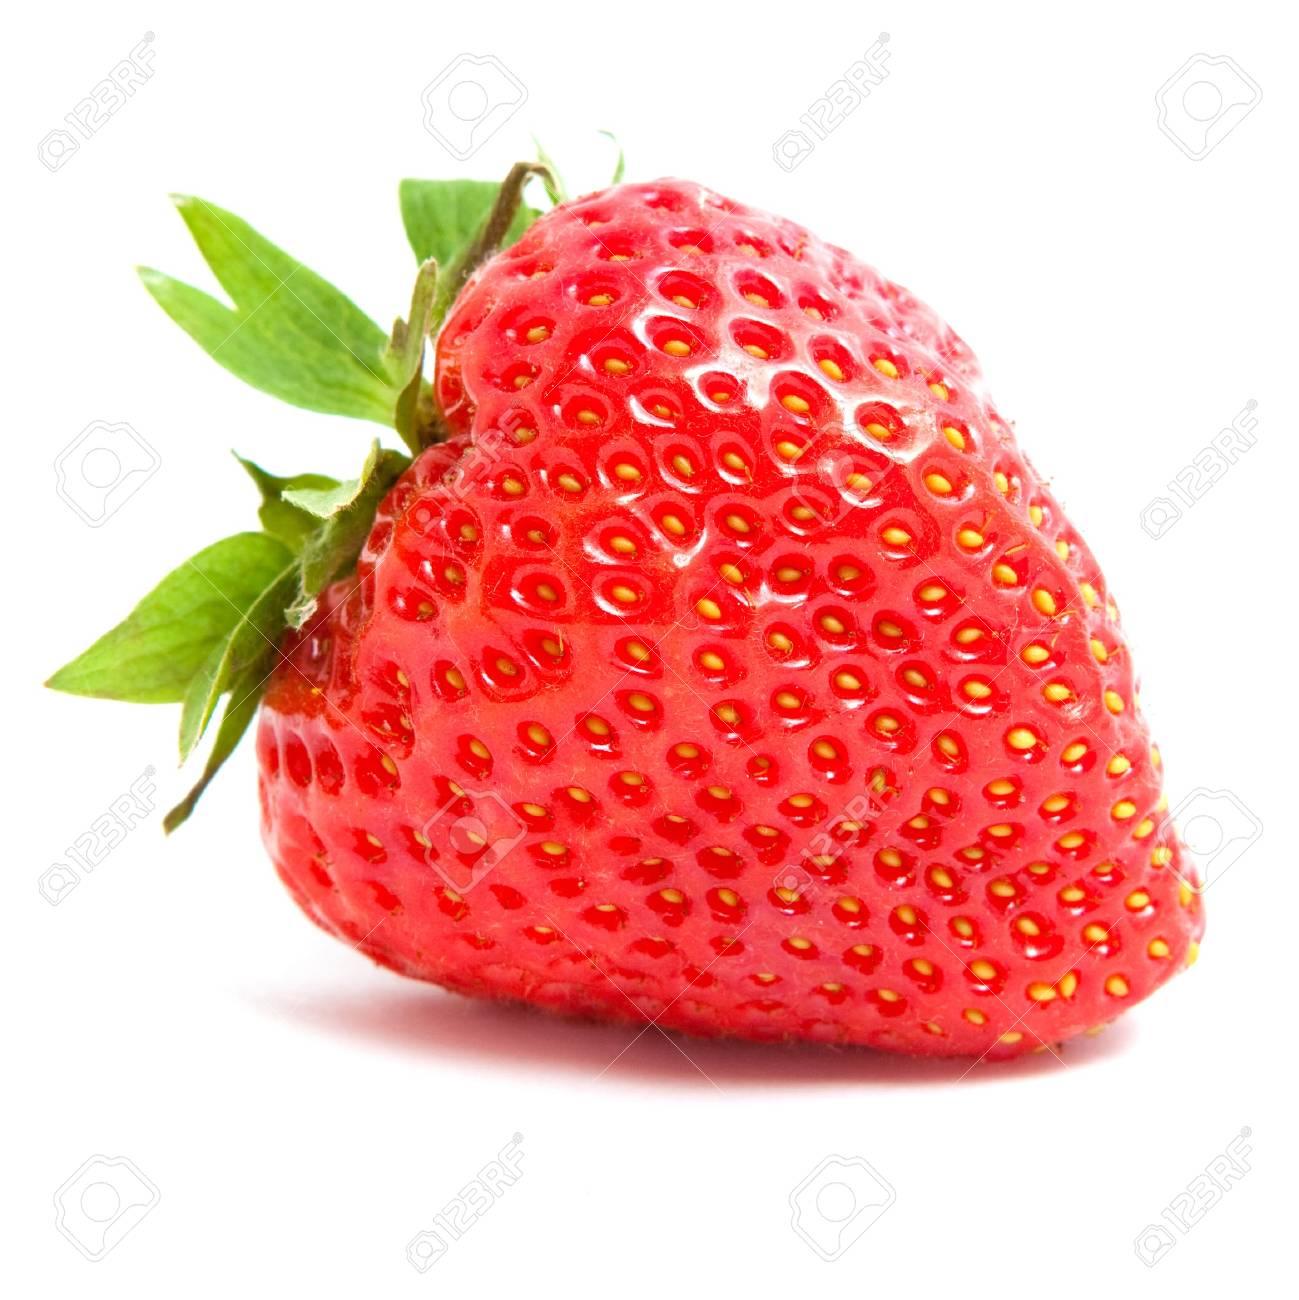 strawberry on white background - 6234257